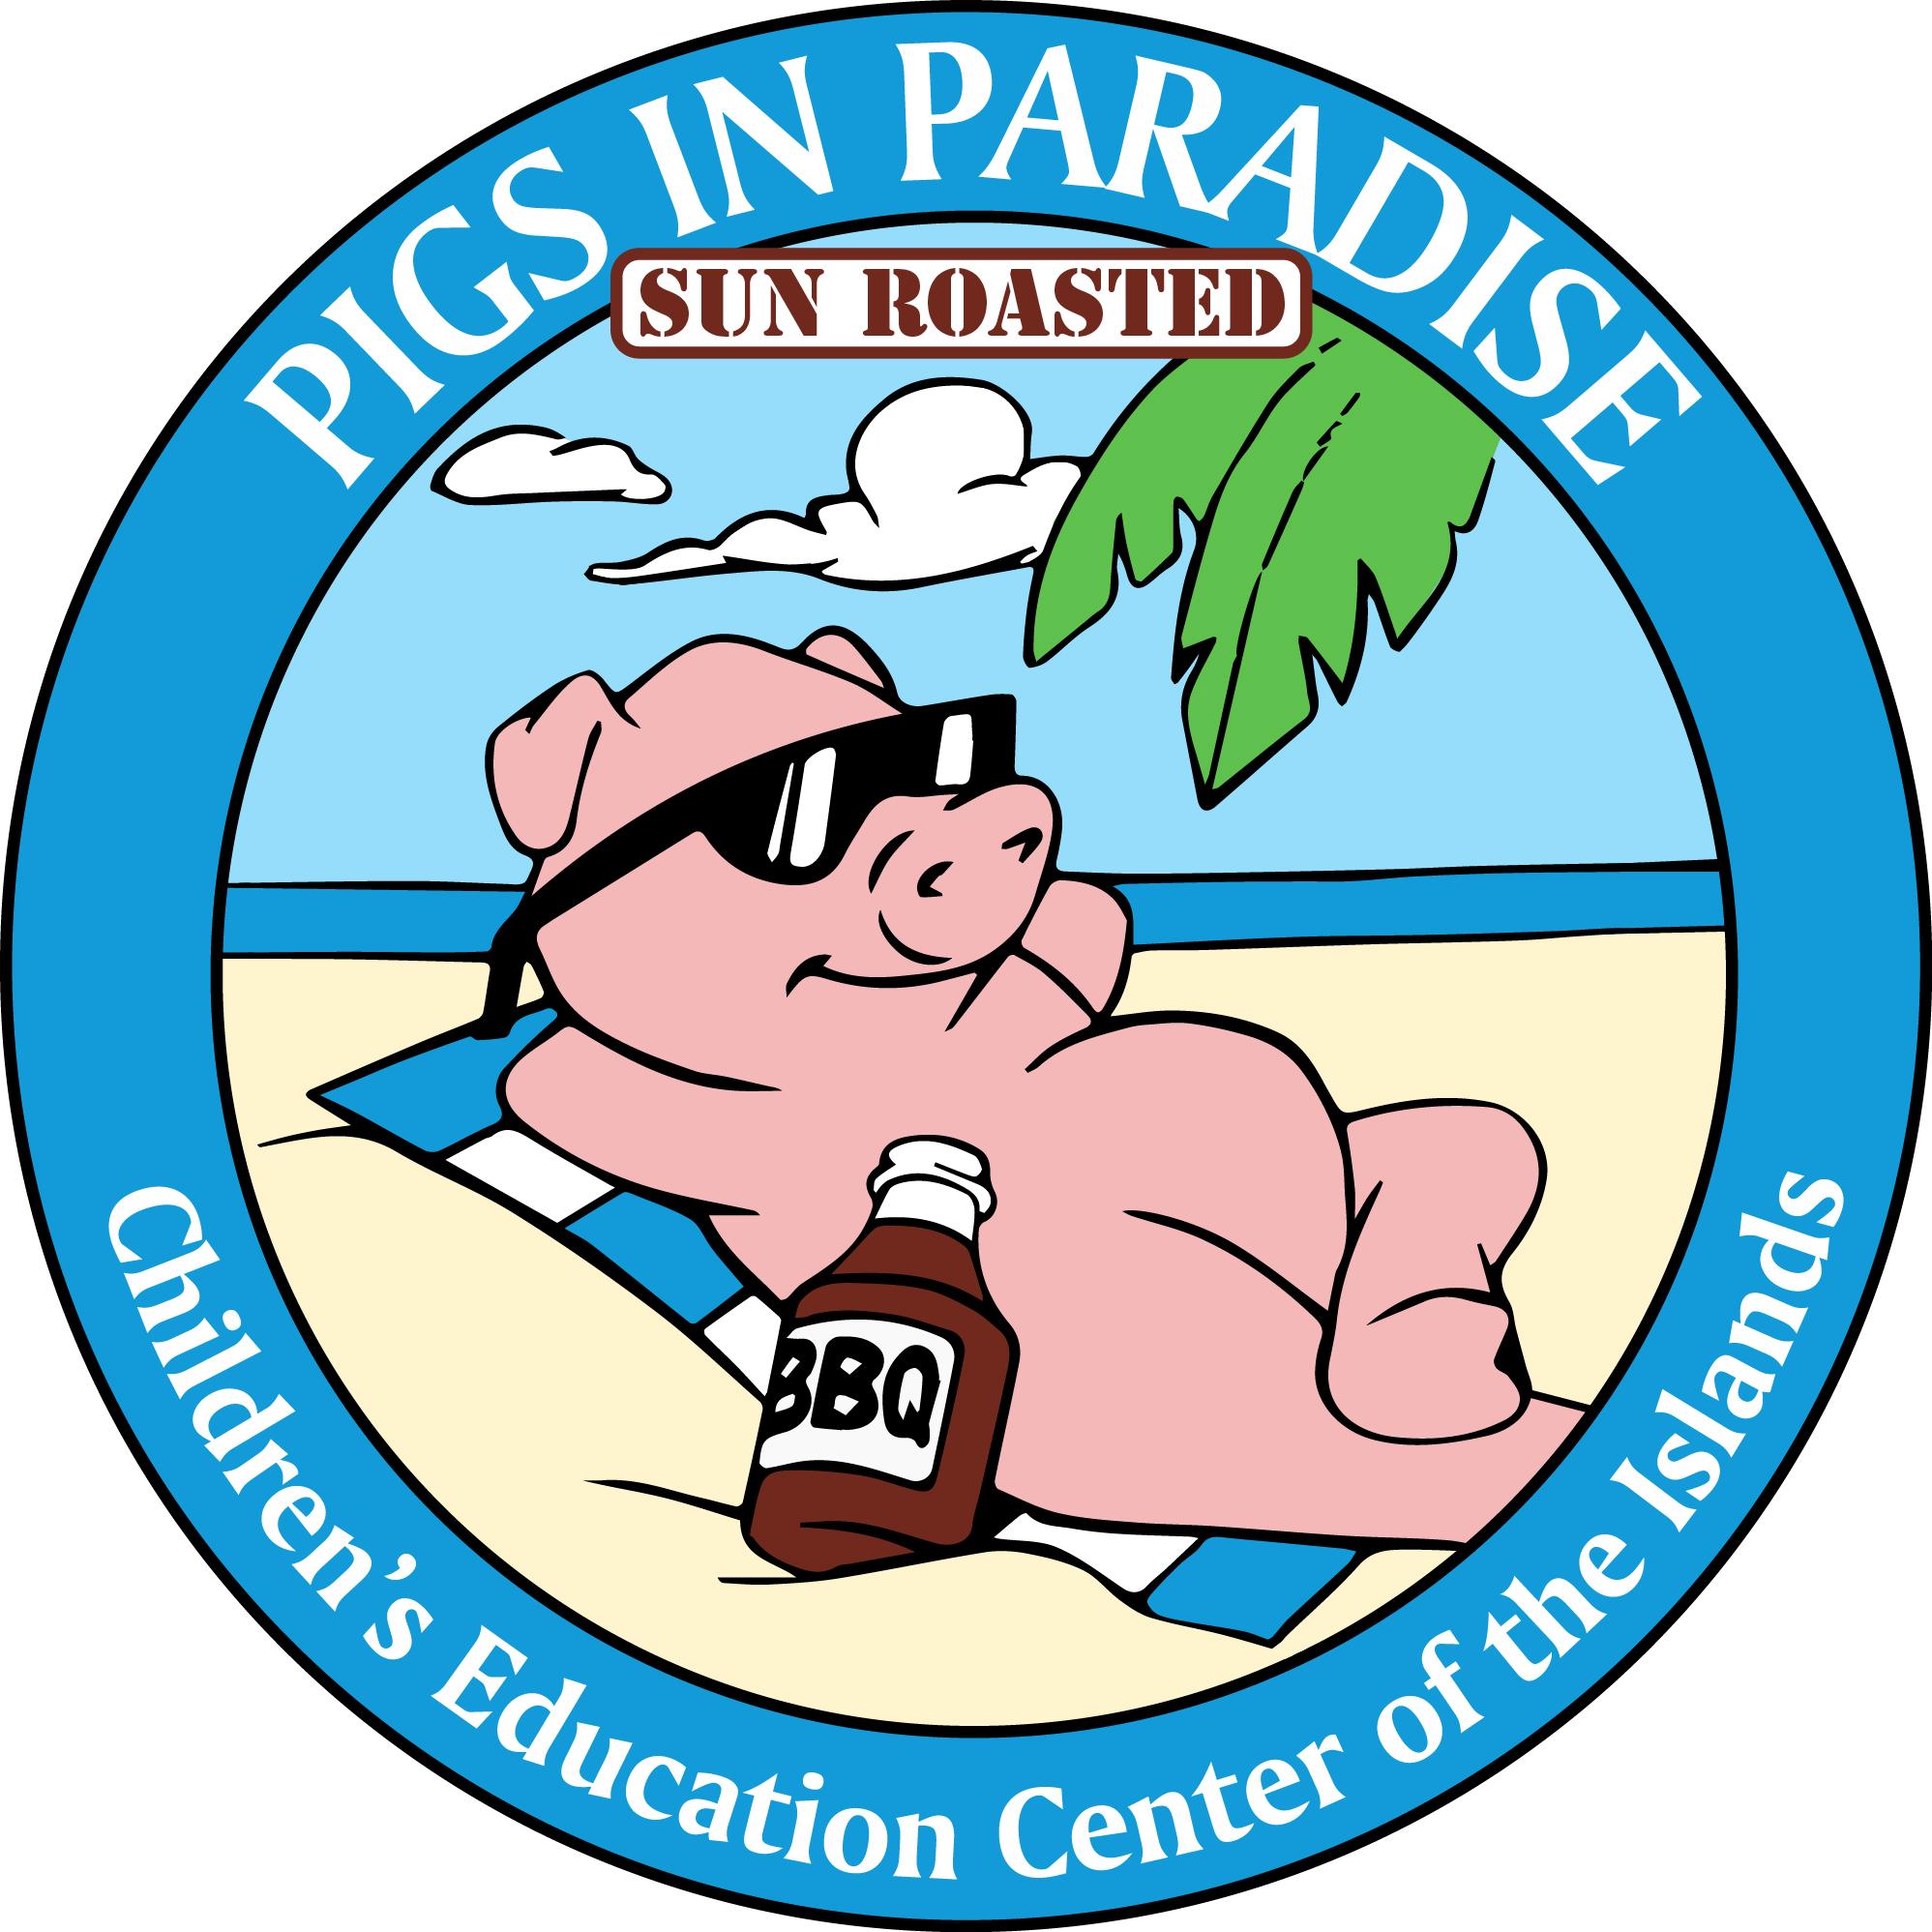 pigsnparadise no date.jpg